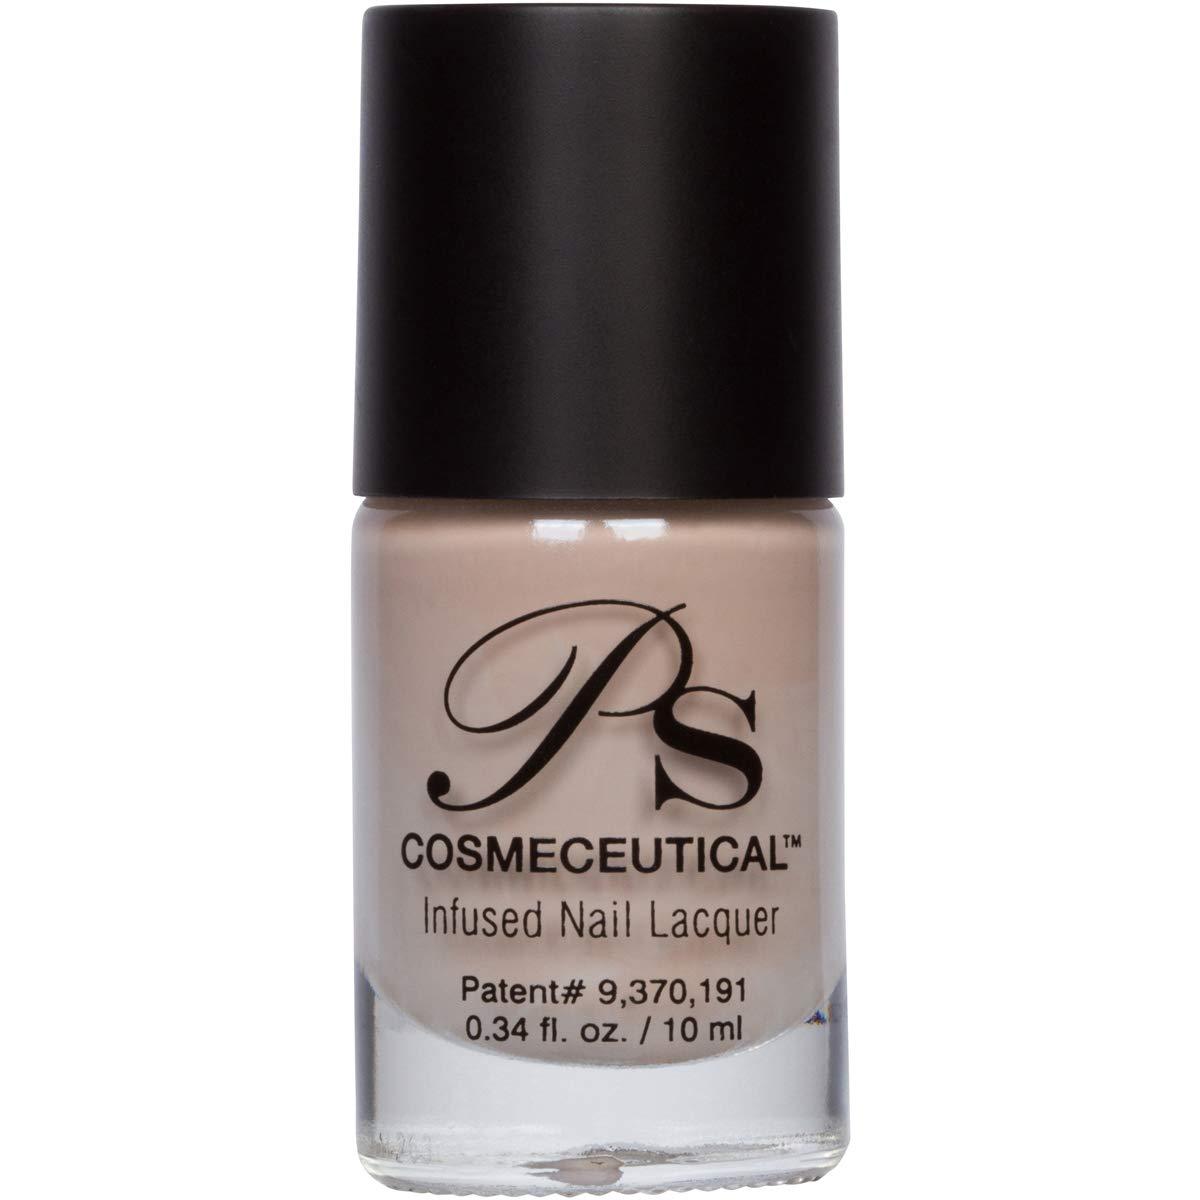 null - PS Polish All Natural Anti-fungal Nail Polish, Safe Non-Toxic Professional Grade Nail Art and Polish Nail Lacquer, Best Nail Polishes for Manicure, Pedicure, Hands, Feet and Nails (Southern Sand)